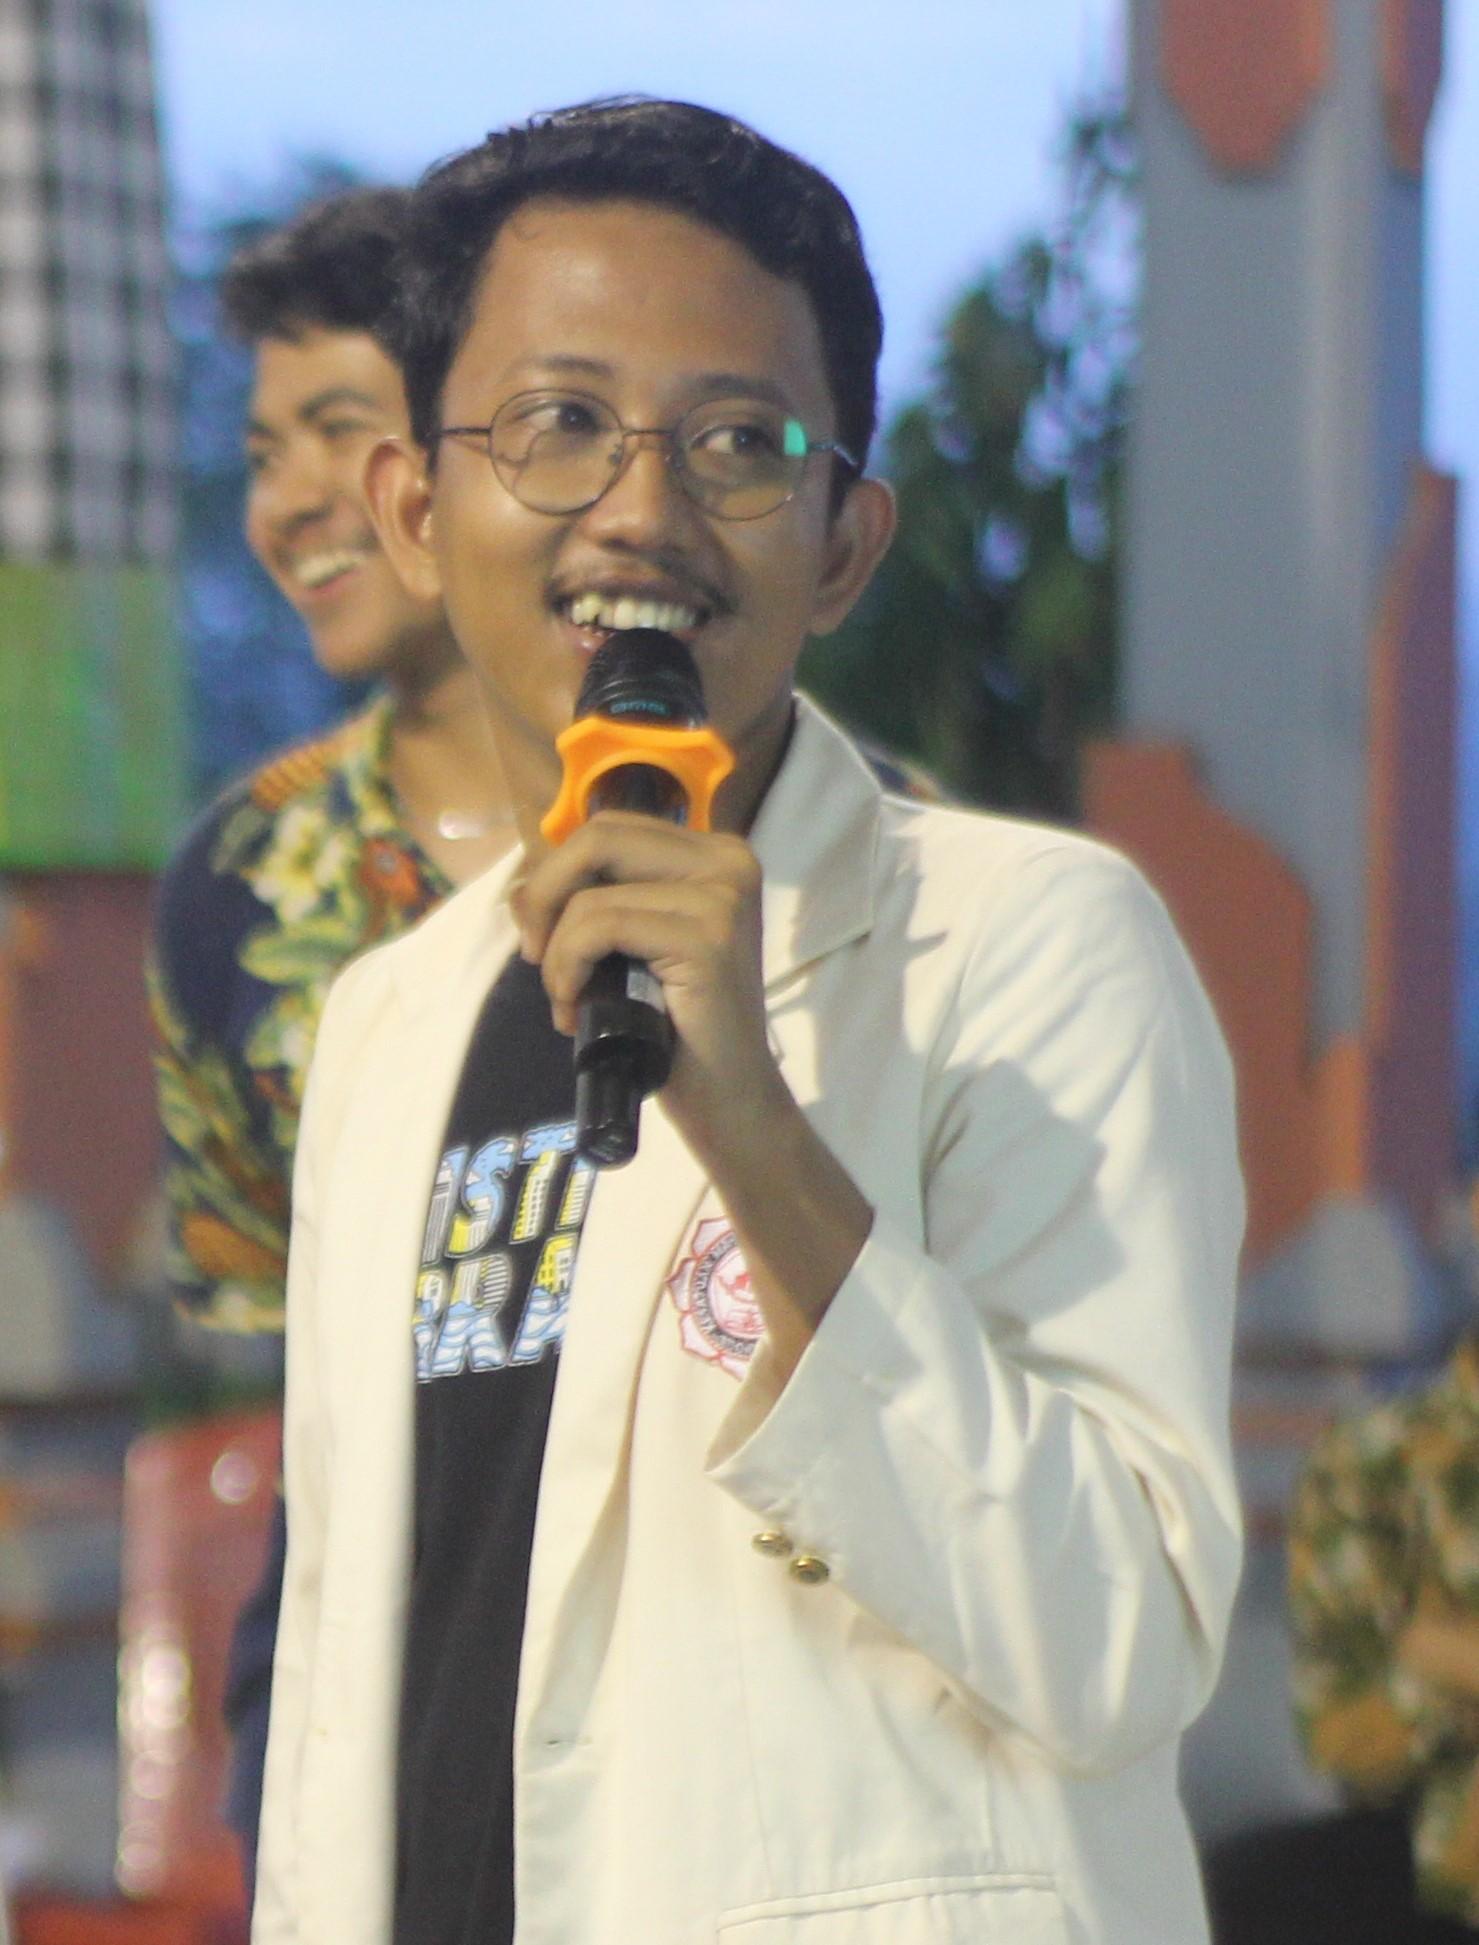 I Putu Yoga Saputra resmi terpilih sebagai Ketua Presidium PP KMHDI periode 2021-2023